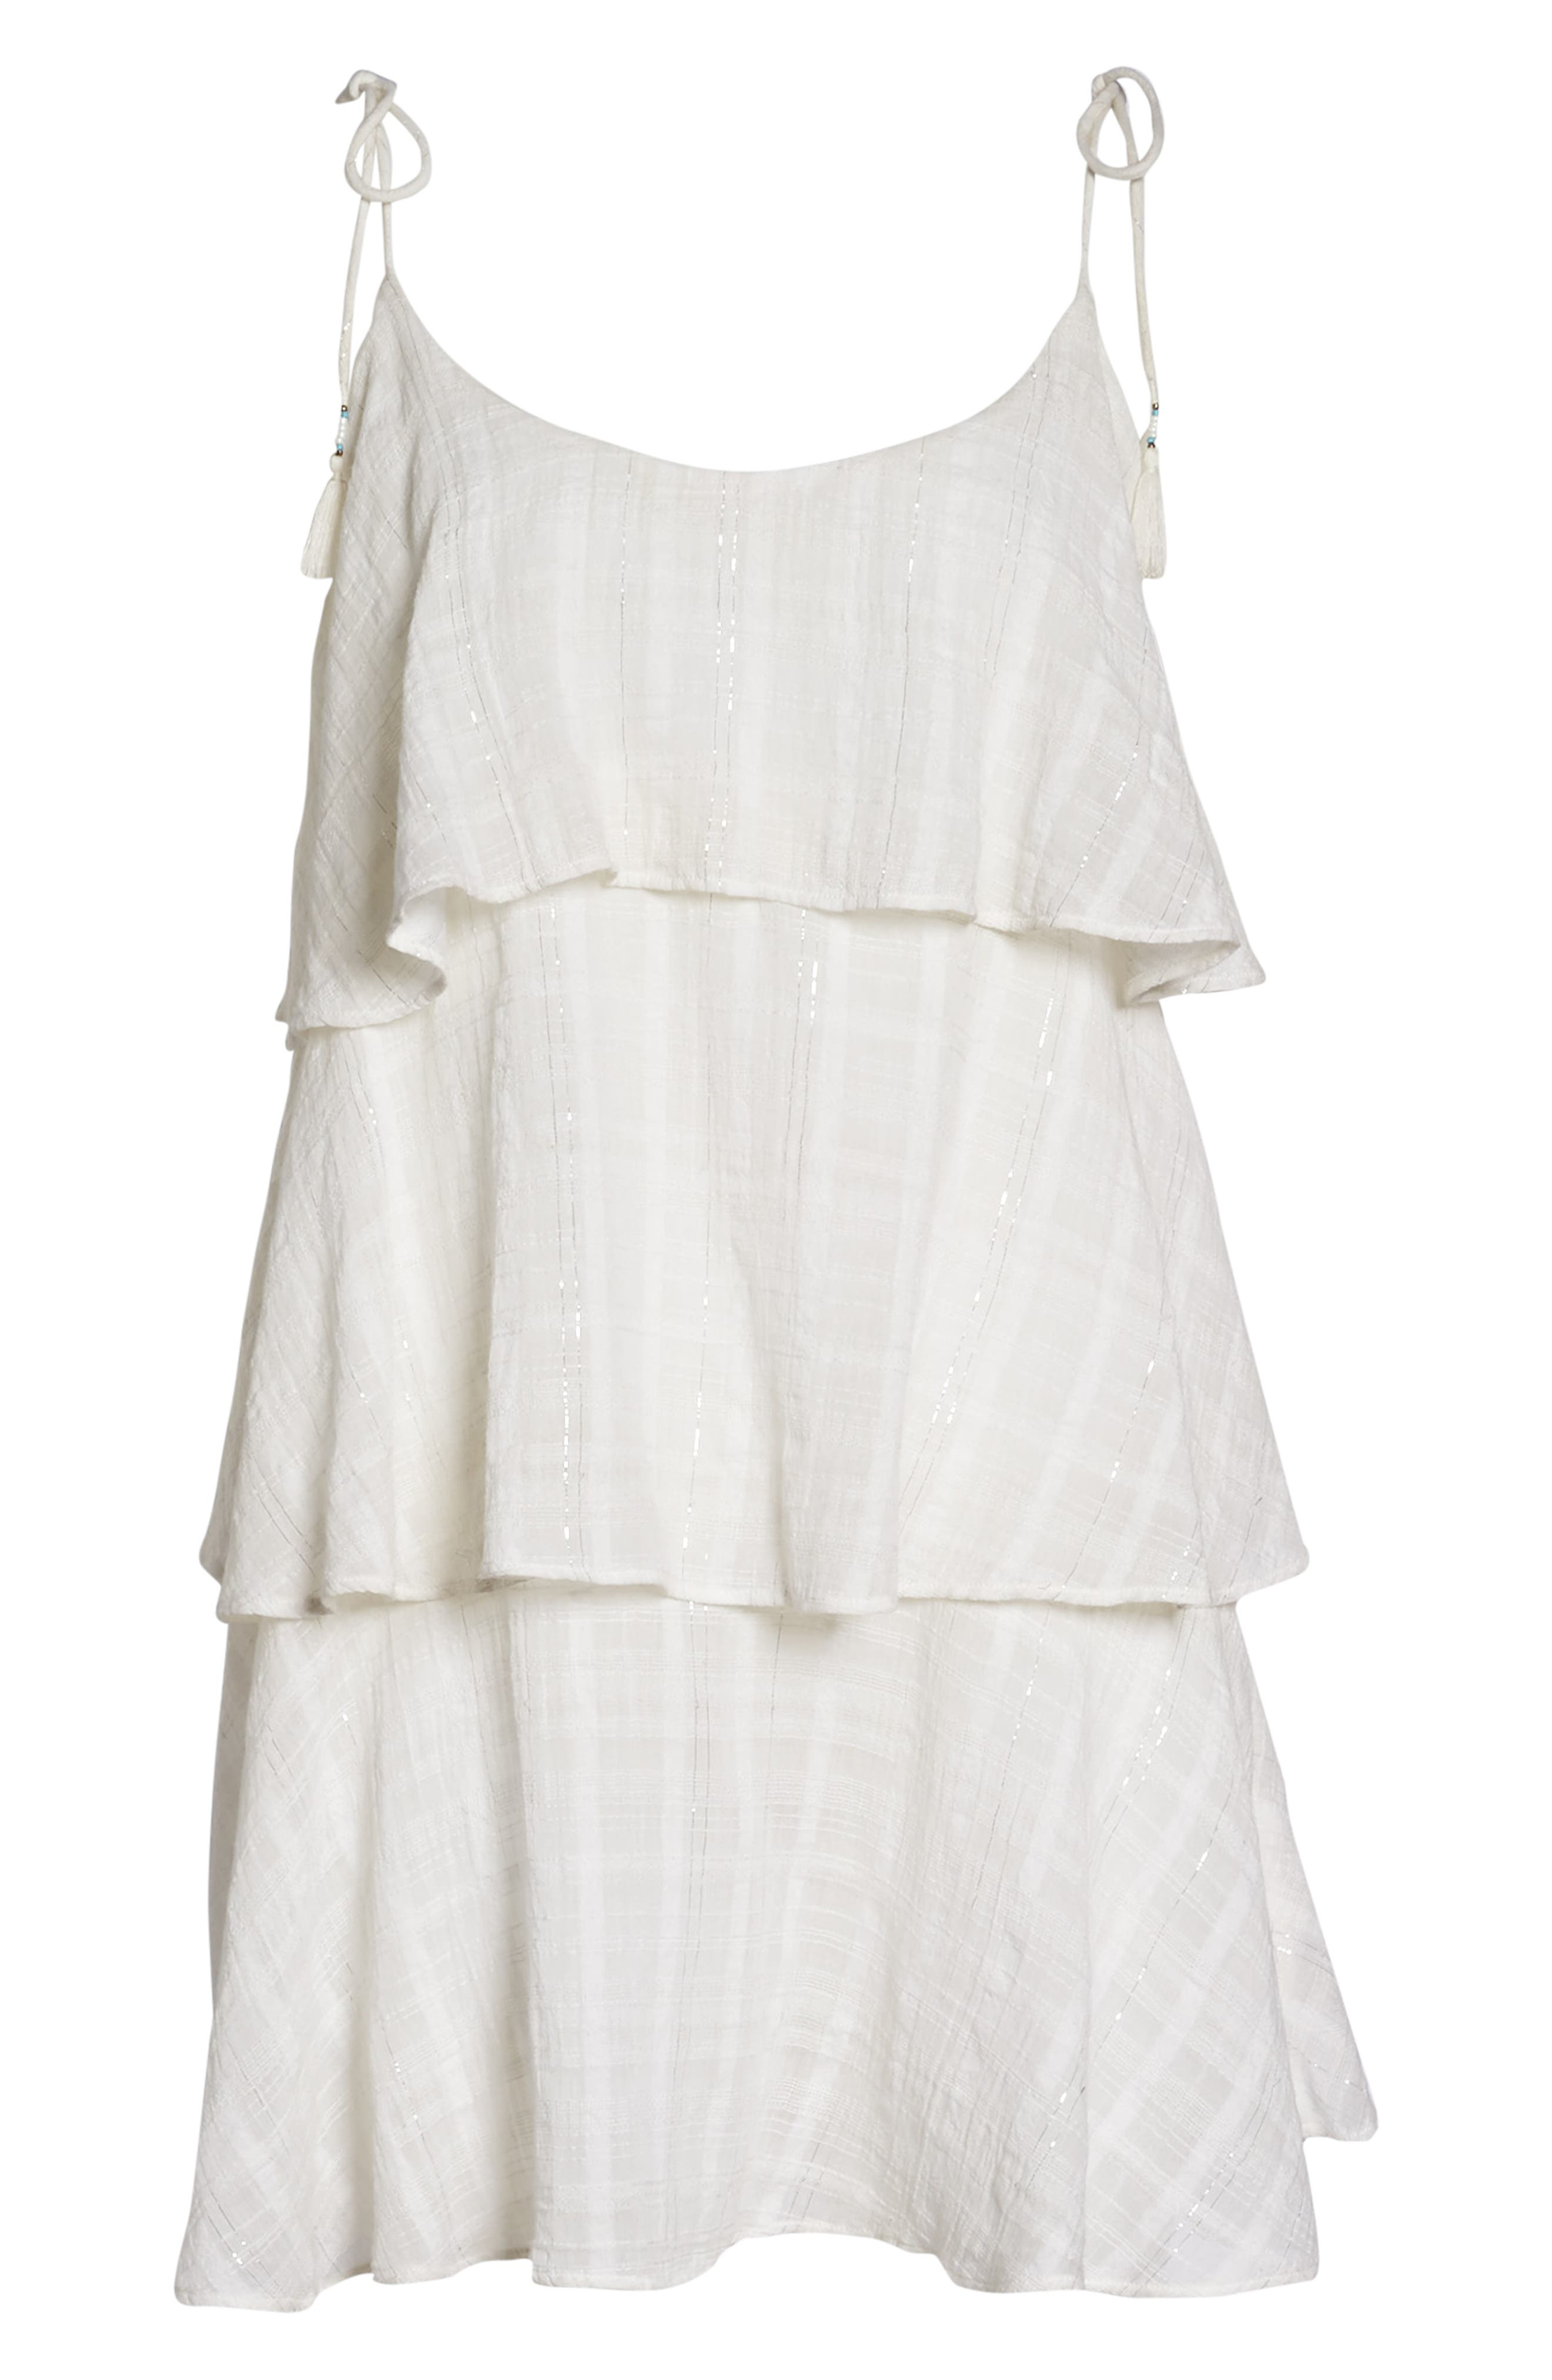 Mariah Ruffled Cover-Up Dress,                             Alternate thumbnail 6, color,                             WHITE-SILVER